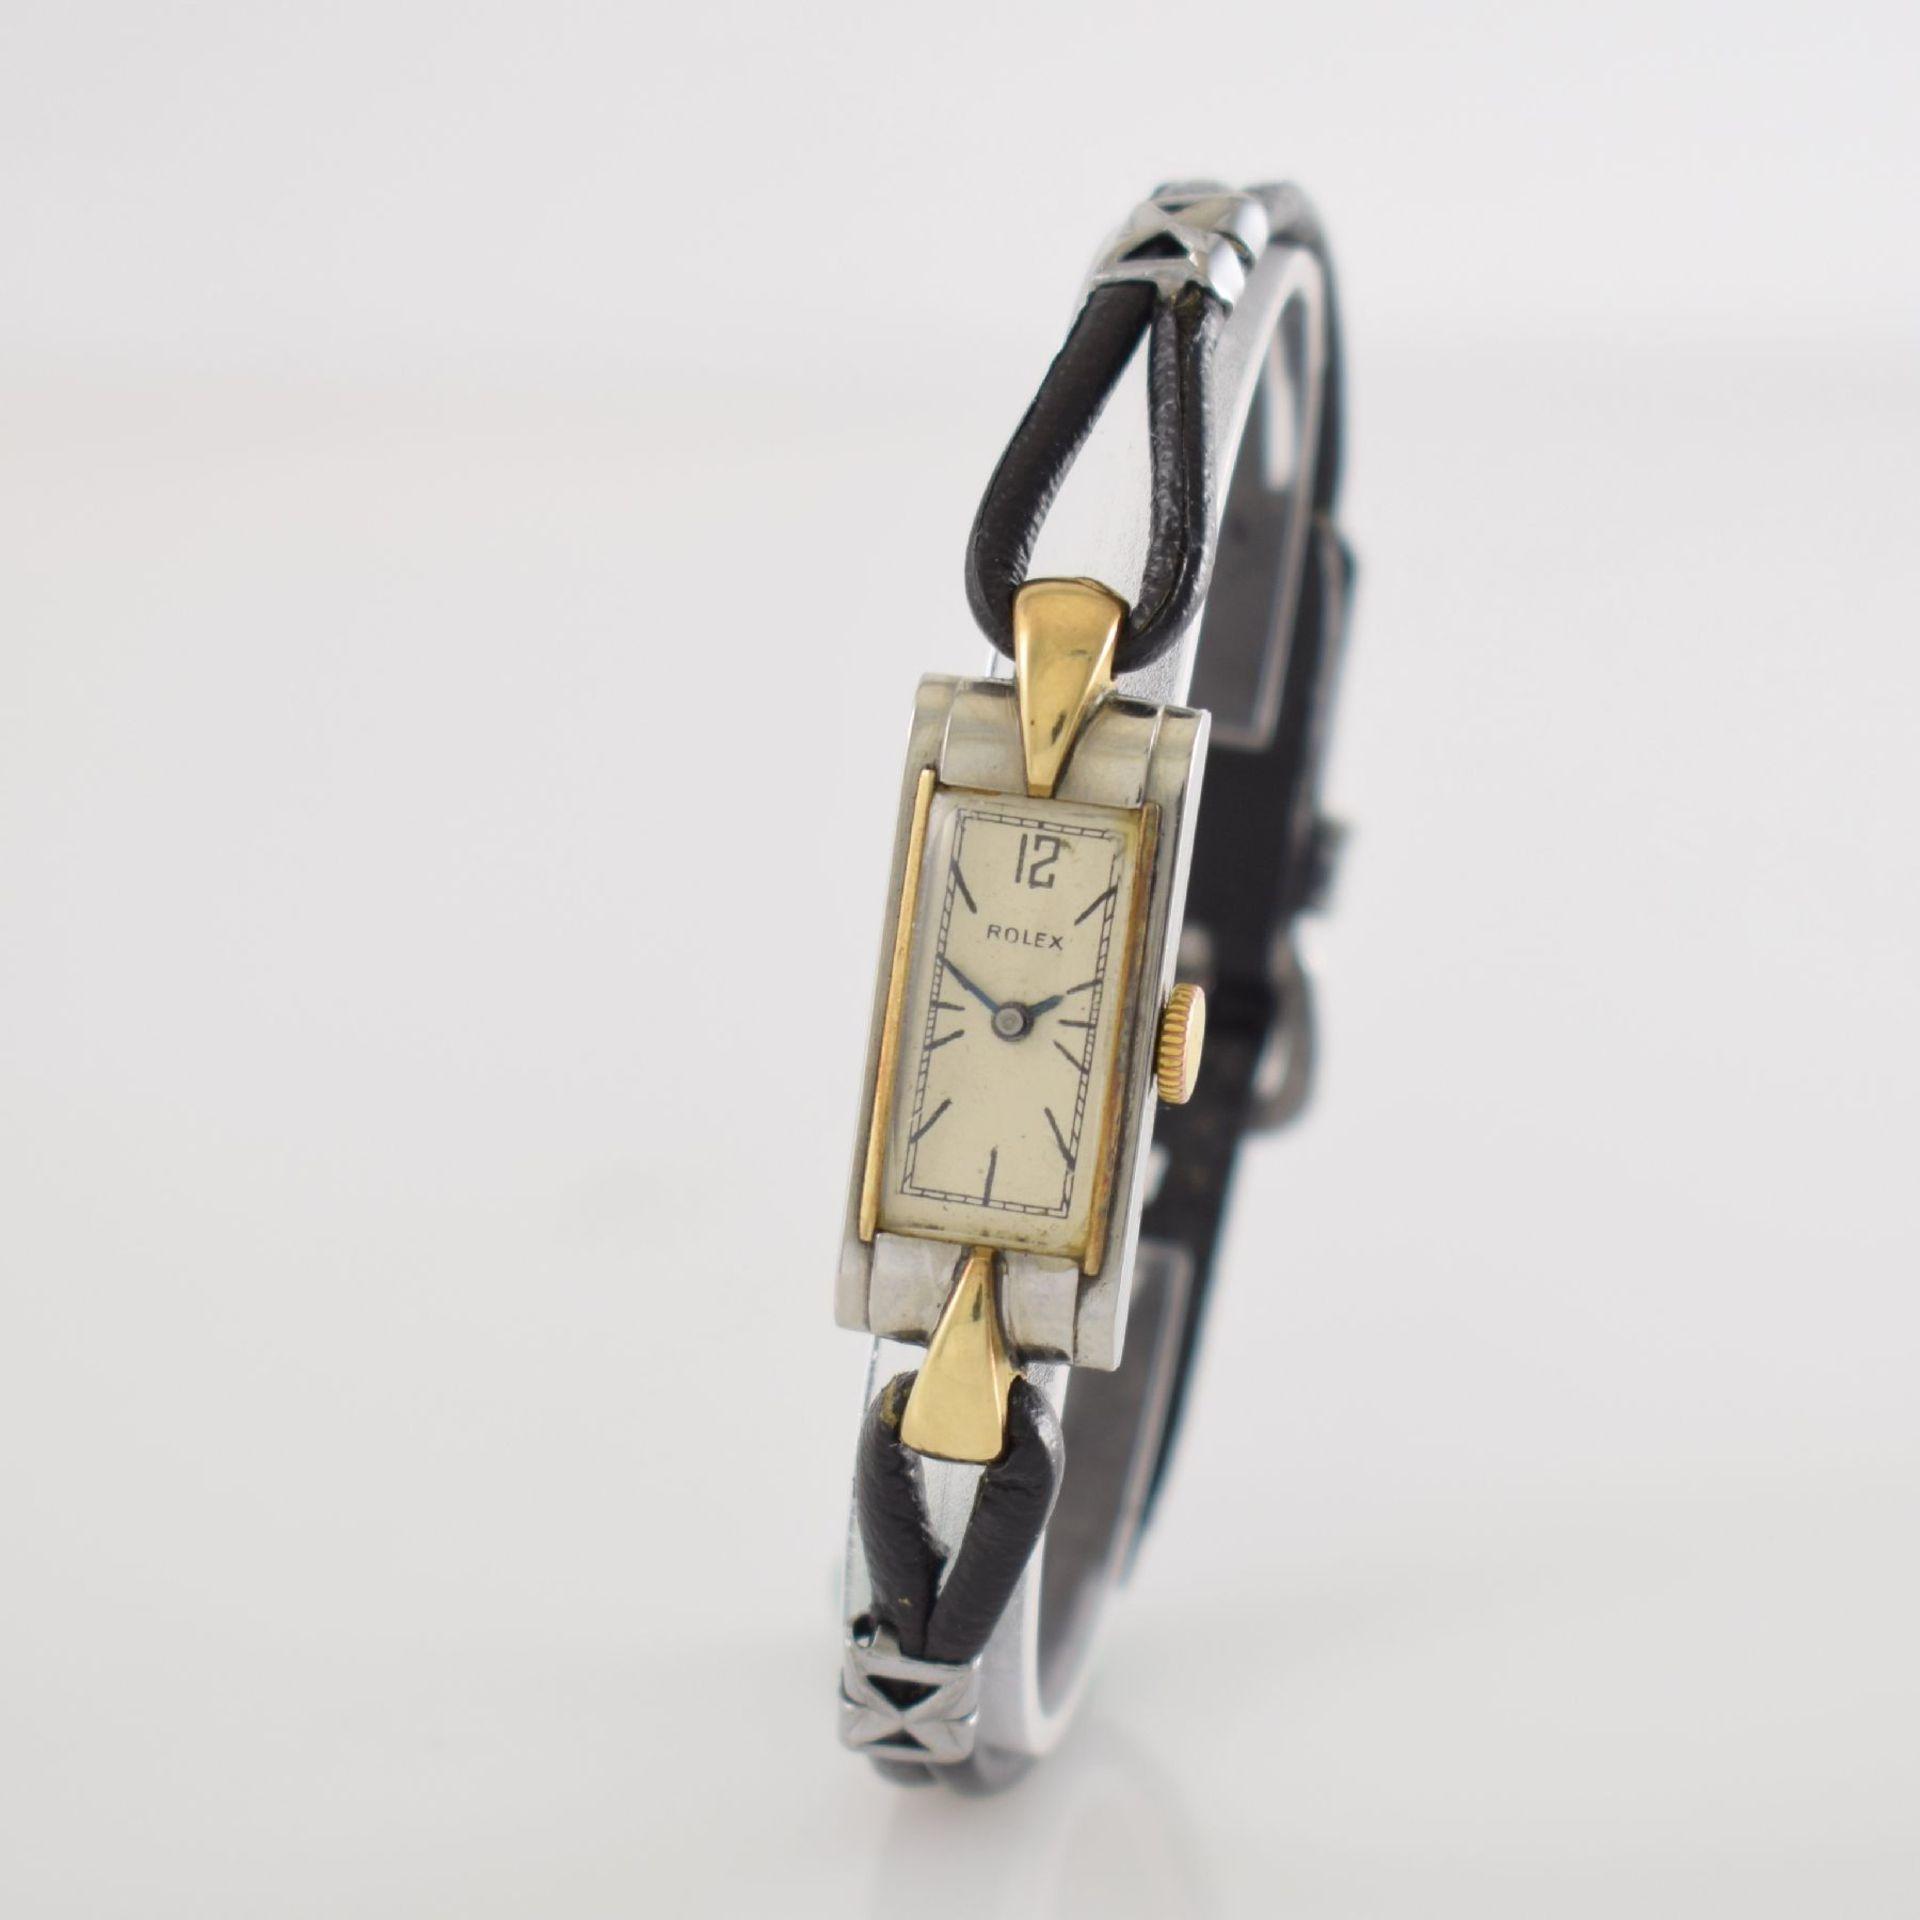 ROLEX Princess Damenarmbanduhr Ref. 1876 in Stahl/Gold, Schweiz um 1935, Handaufzug, rechteck. - Bild 3 aus 8